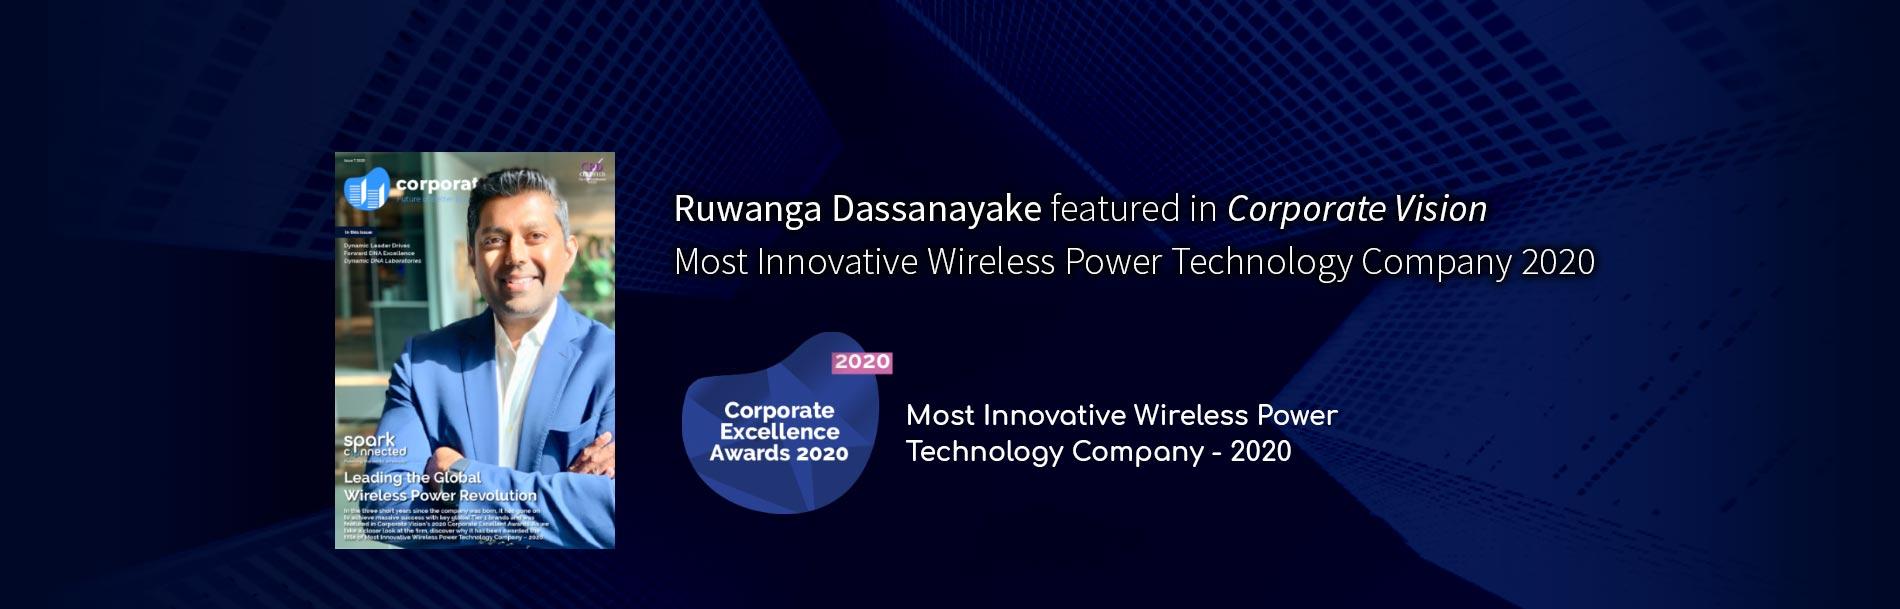 Ruwanga Dassanayake featured in Corporate Vision - Most Innovative Wireless Power Technology Company 2020